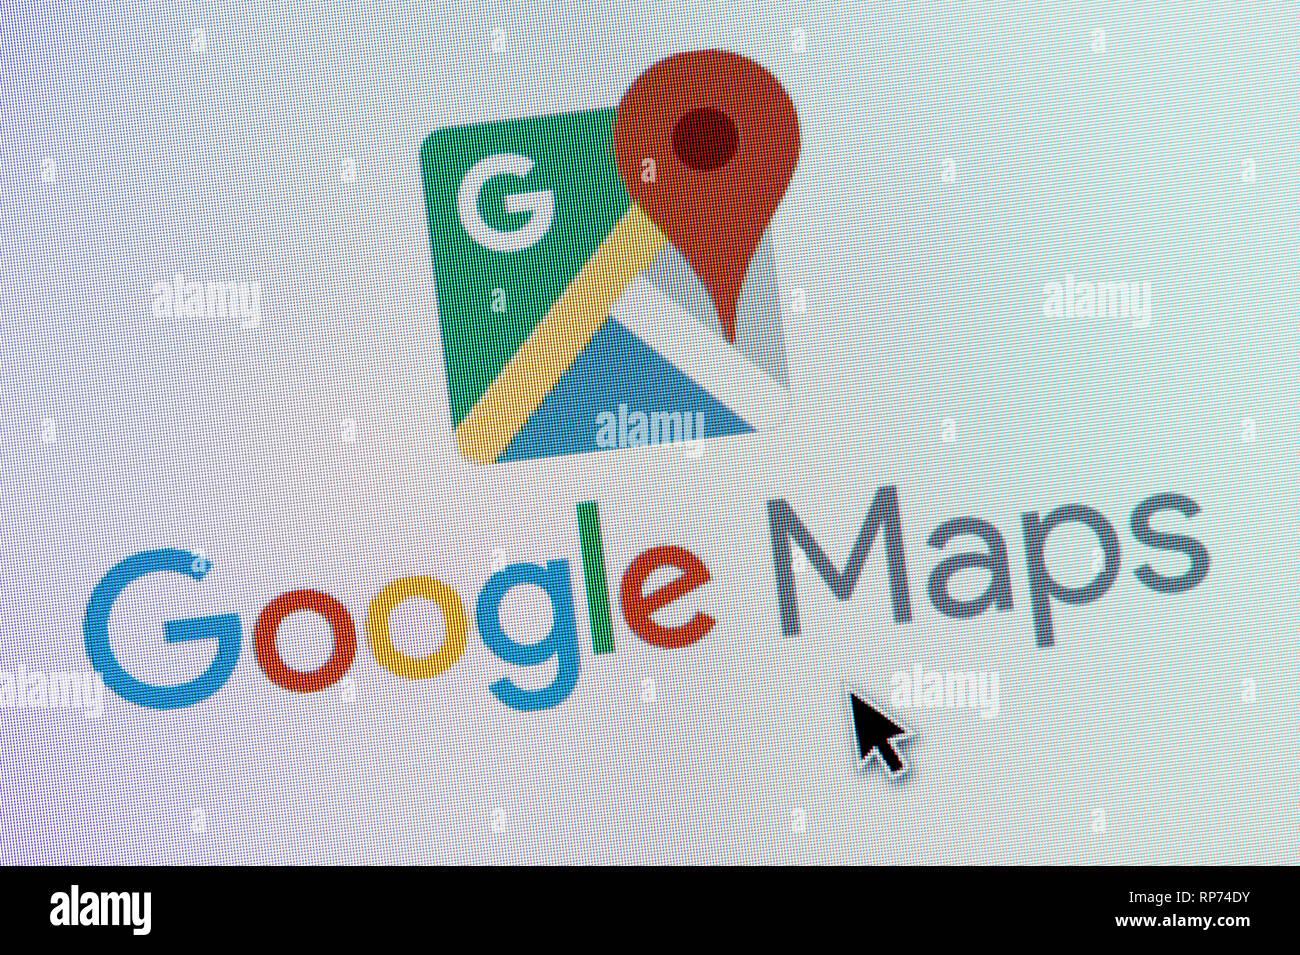 Google Maps Stock Photos & Google Maps Stock Images - Alamy on albany florida map, albany ky map, albany wy map, albany il map, albany al map, albany oregon map, albany nh map, albany bc map, albany ny map, albany ohio map, albany vt map, albany ga map, albany chicago map, albany la map, albany or map, albany wi map, albany canada map, albany state map, albany ca map, albany australia map,